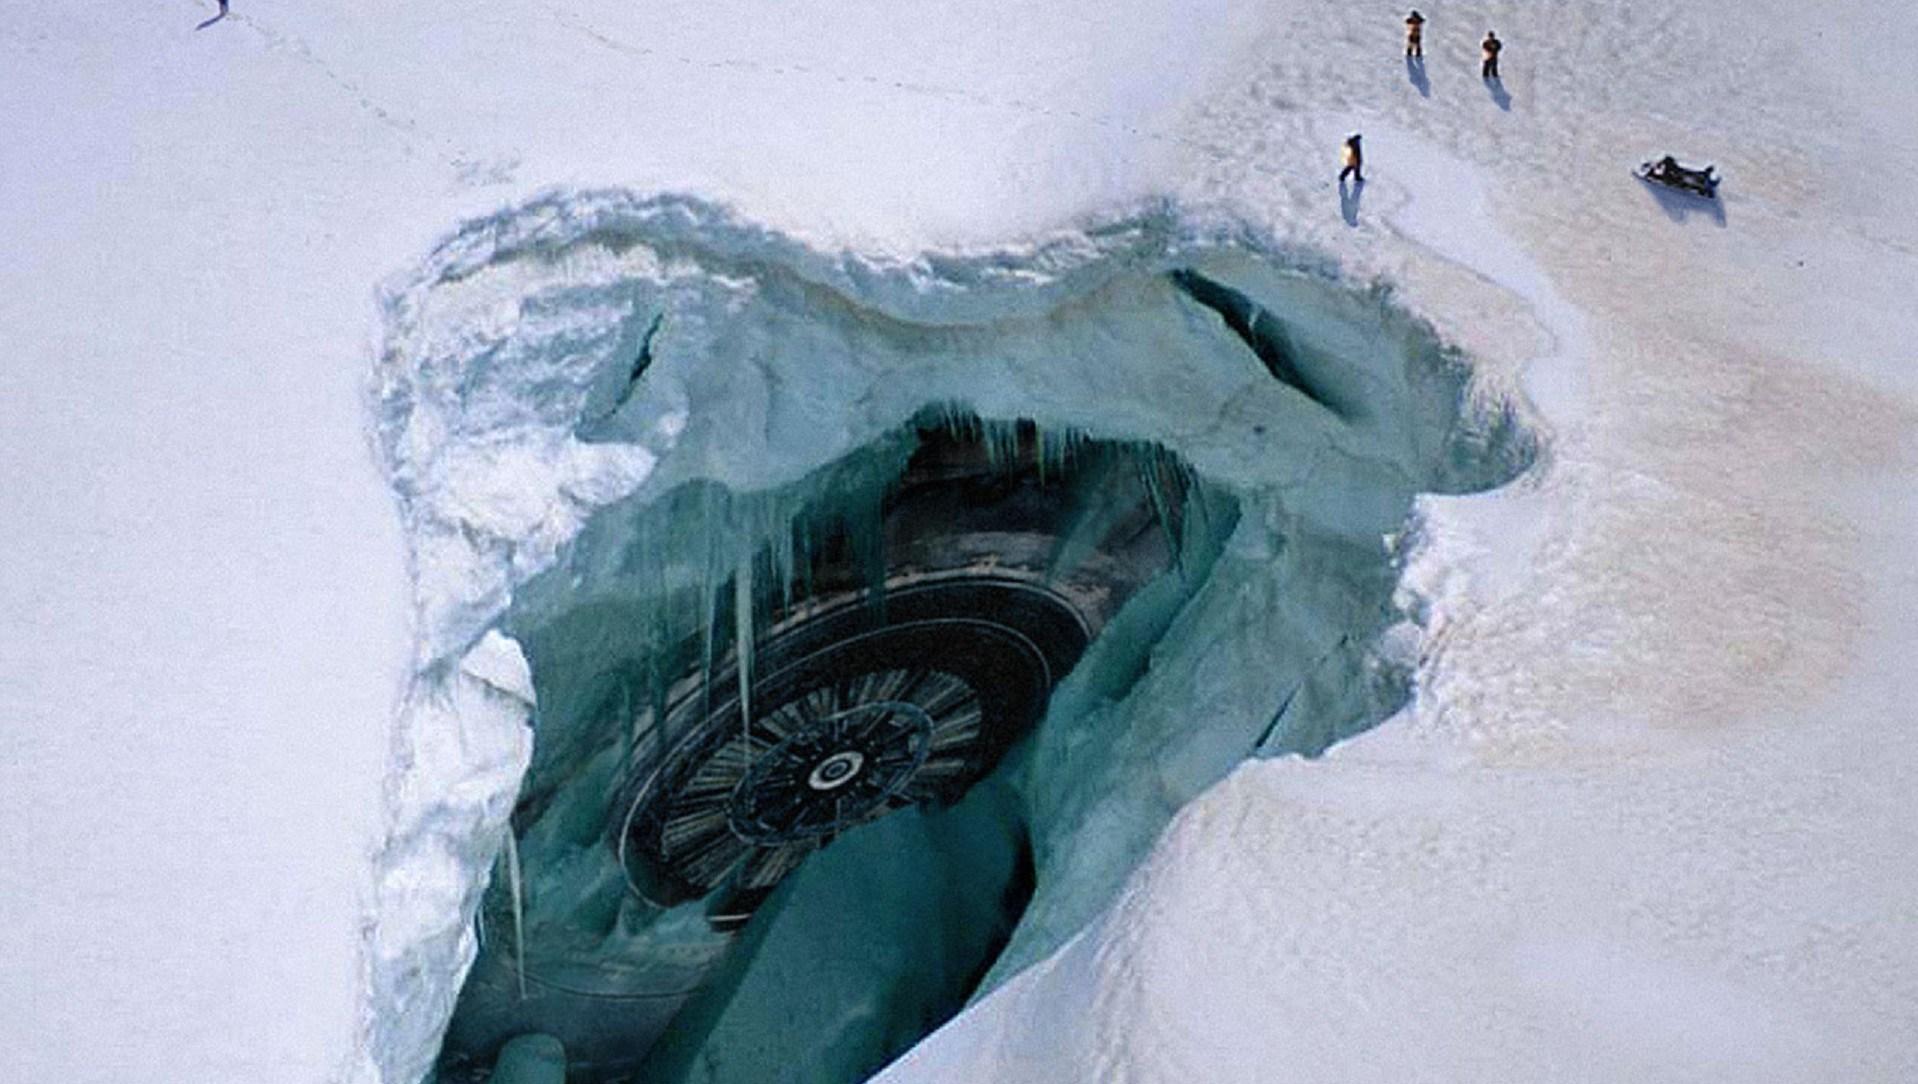 Wat is er gaande op Antarctica? - Ellaster